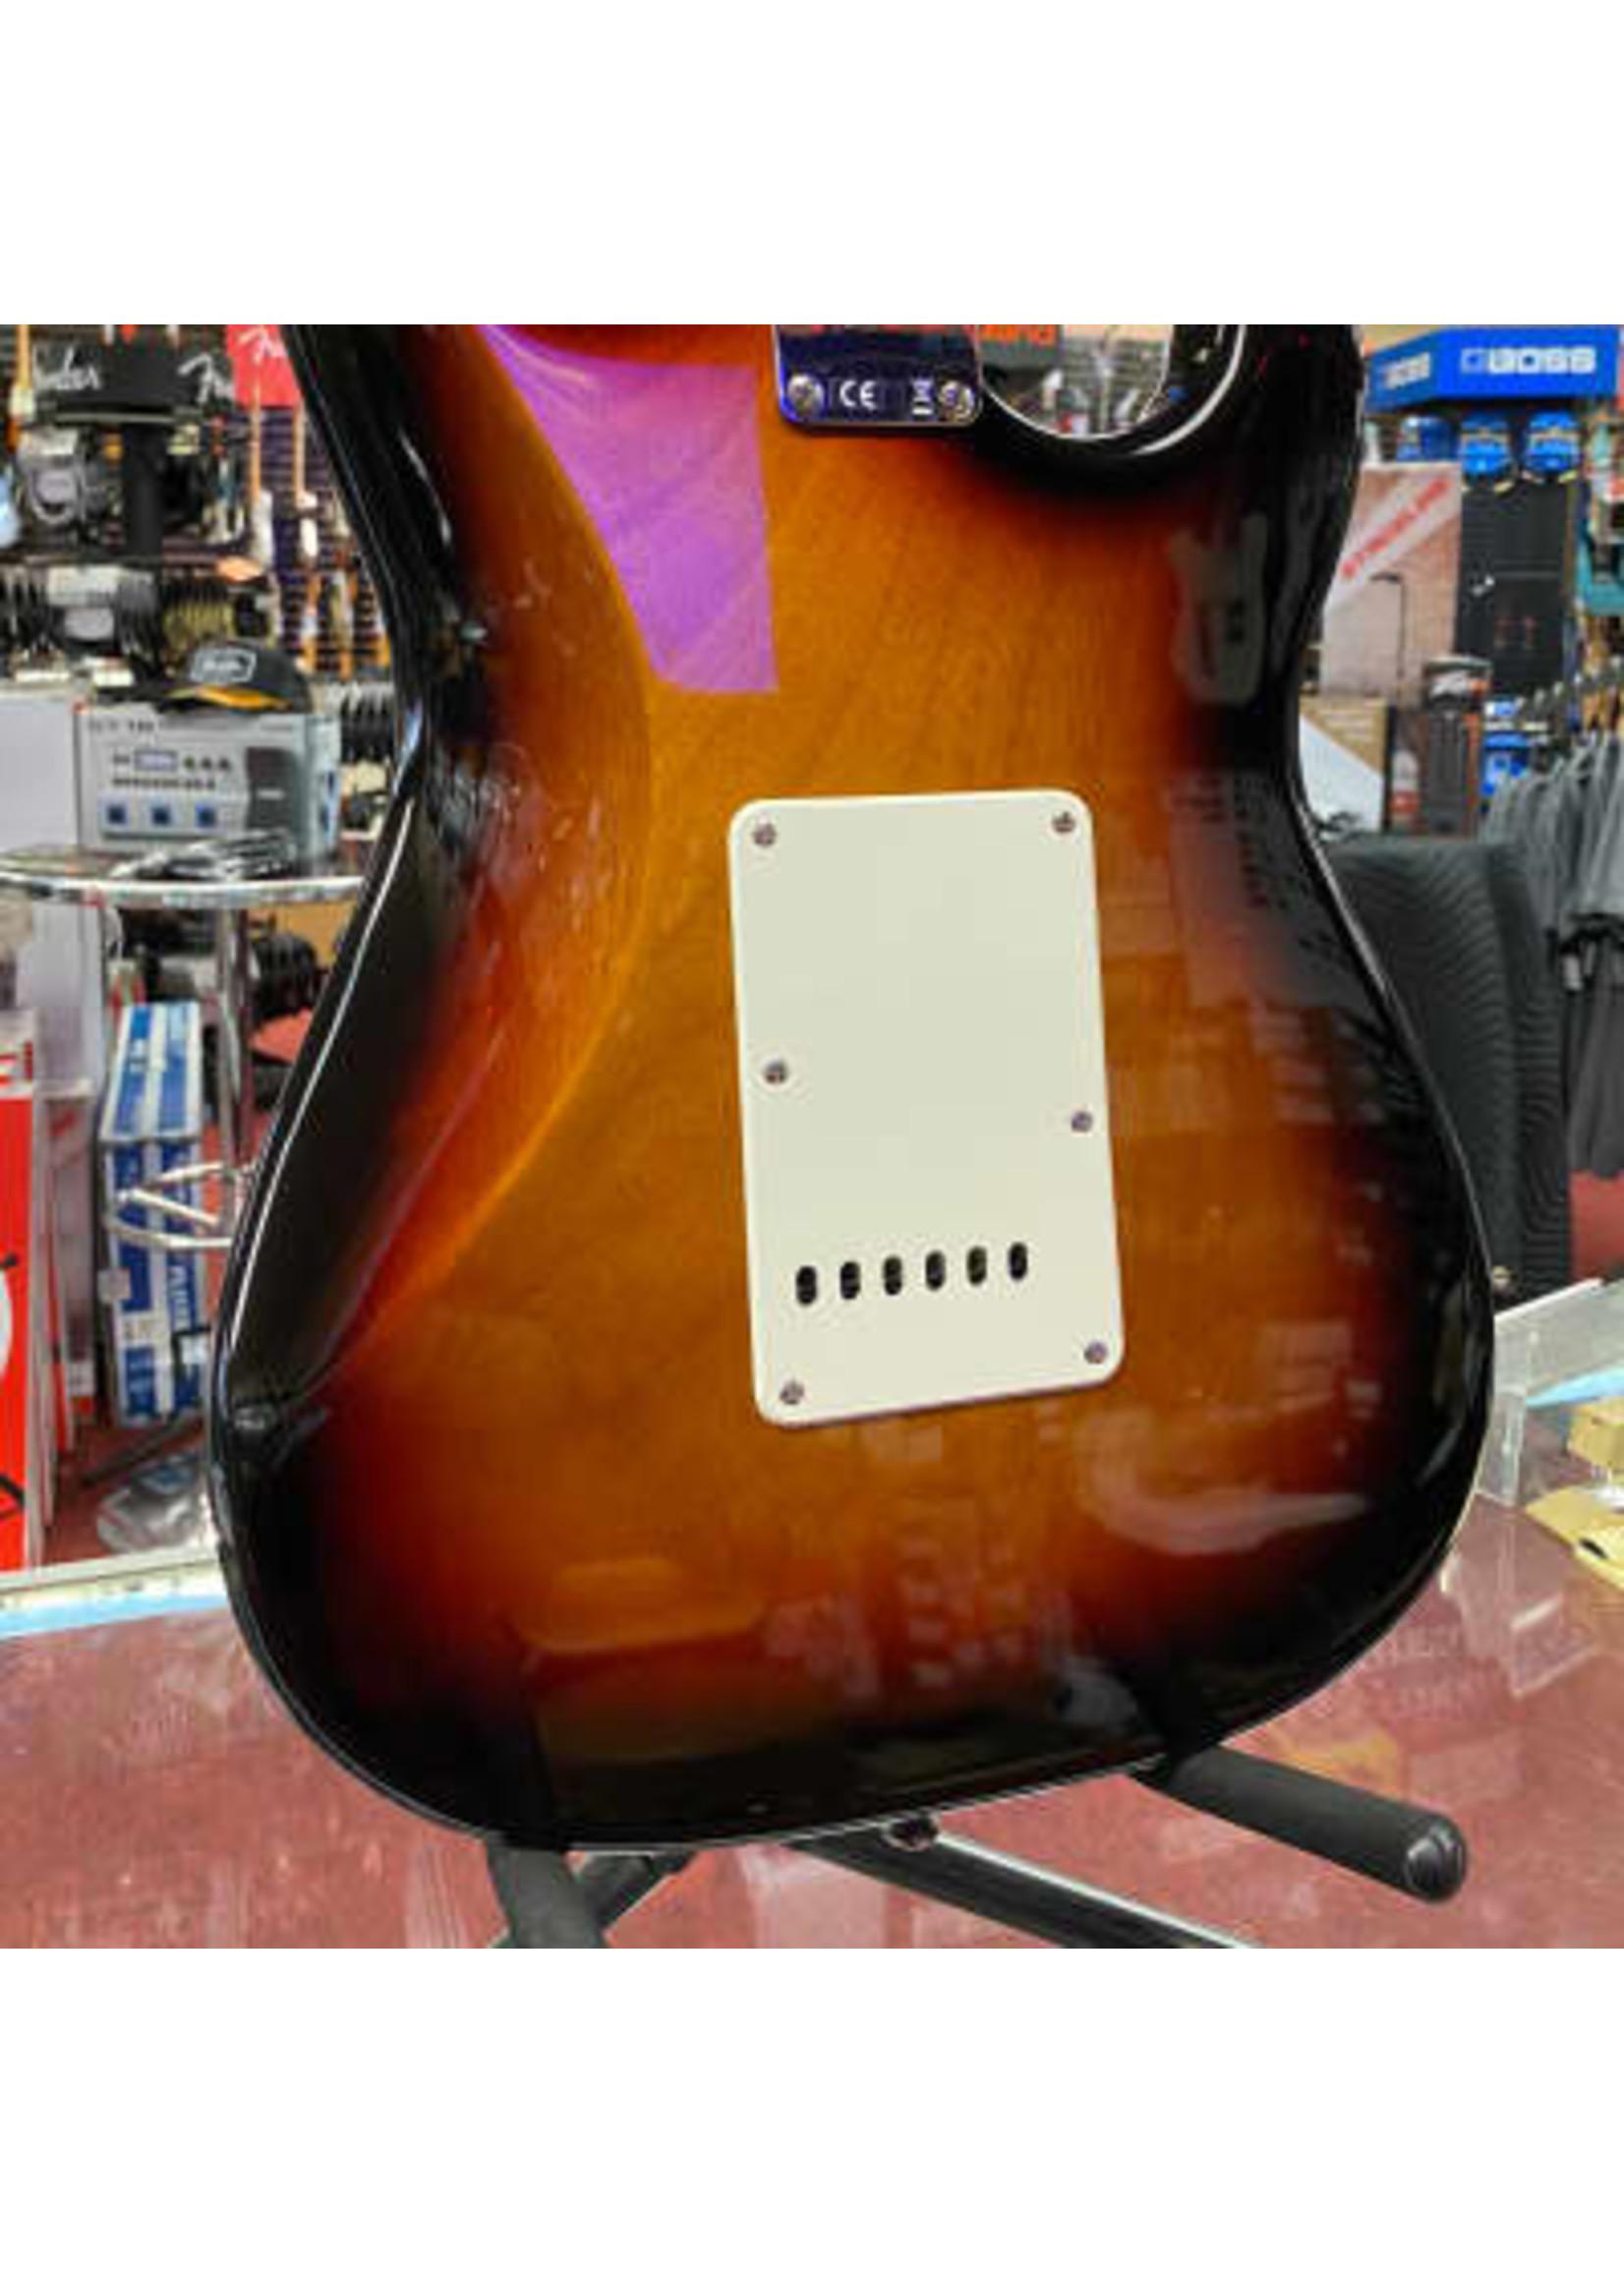 Squier Squier Classic Vibe '60s Stratocaster® Left-Handed, Laurel Fingerboard, 3-Color Sunburst